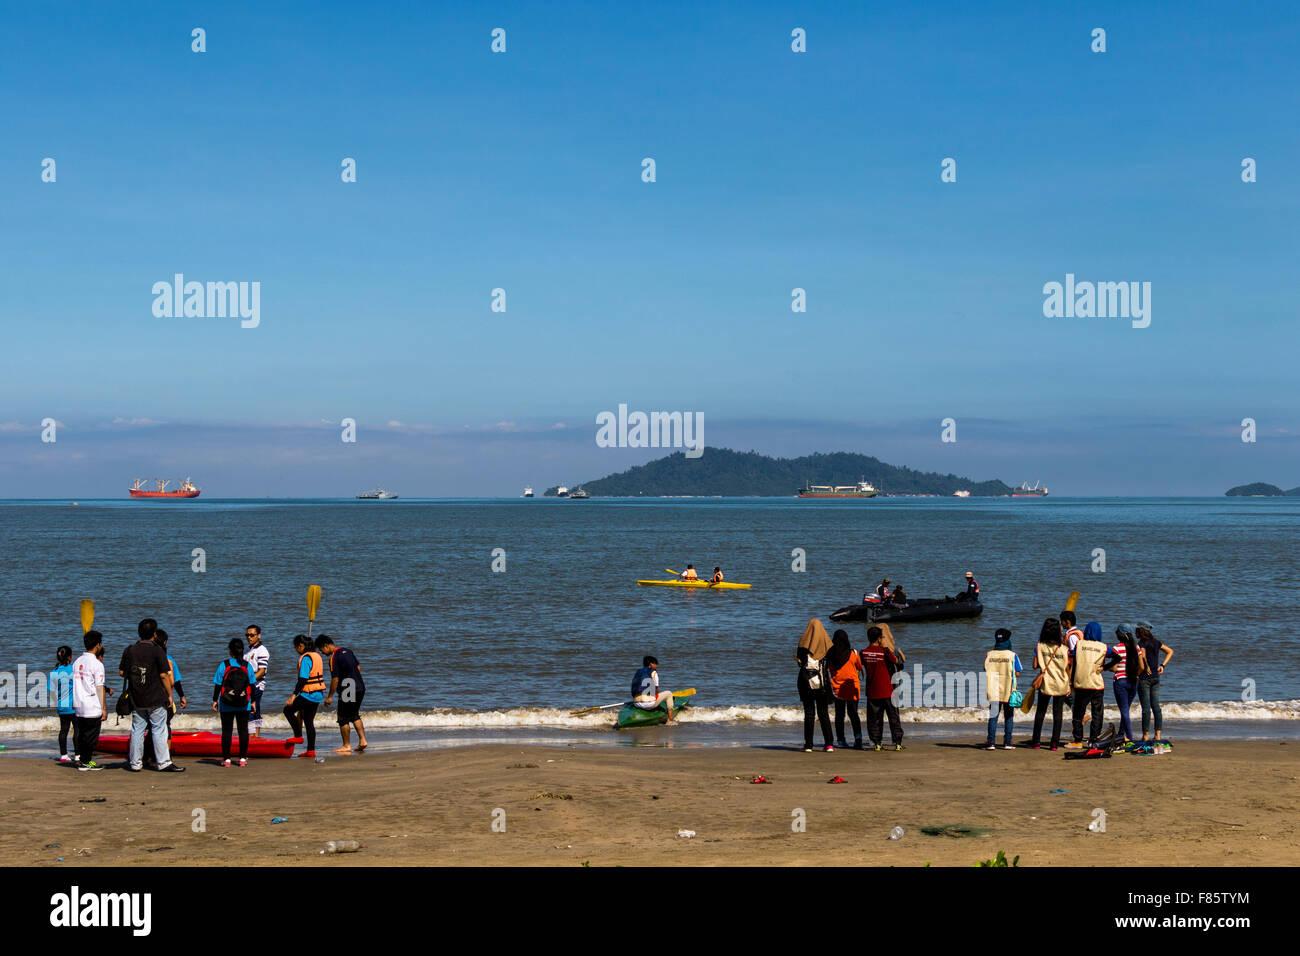 Likas Bay Kota Kinabalu Sabah East Malaysia Borneo people on beach boating in South China Sea - Stock Image